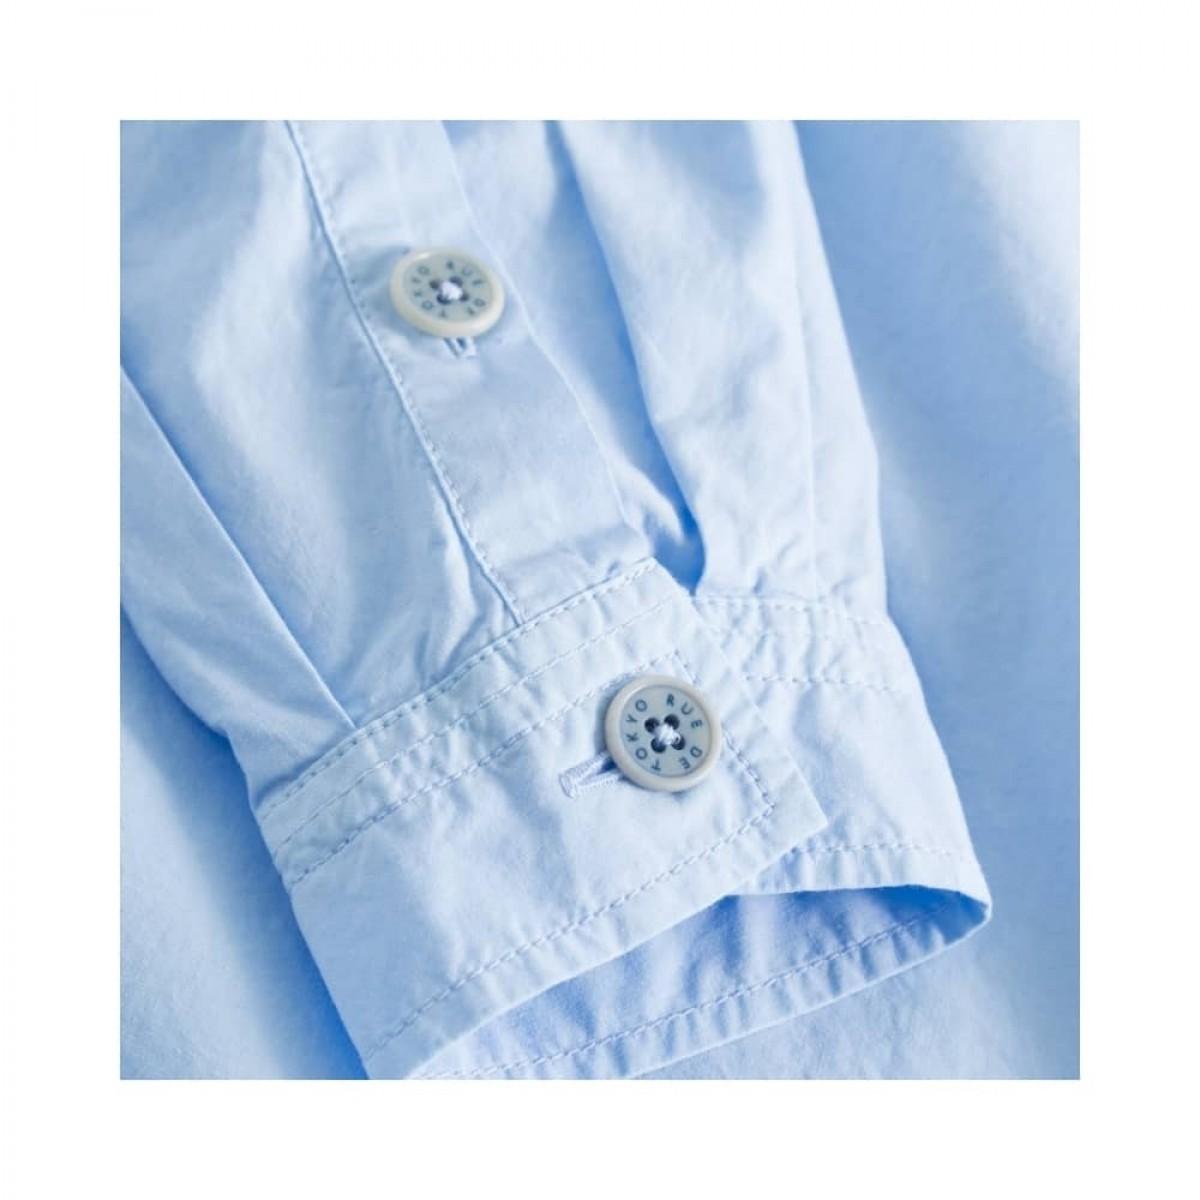 shiloh skjorte - light blue - knap detalje